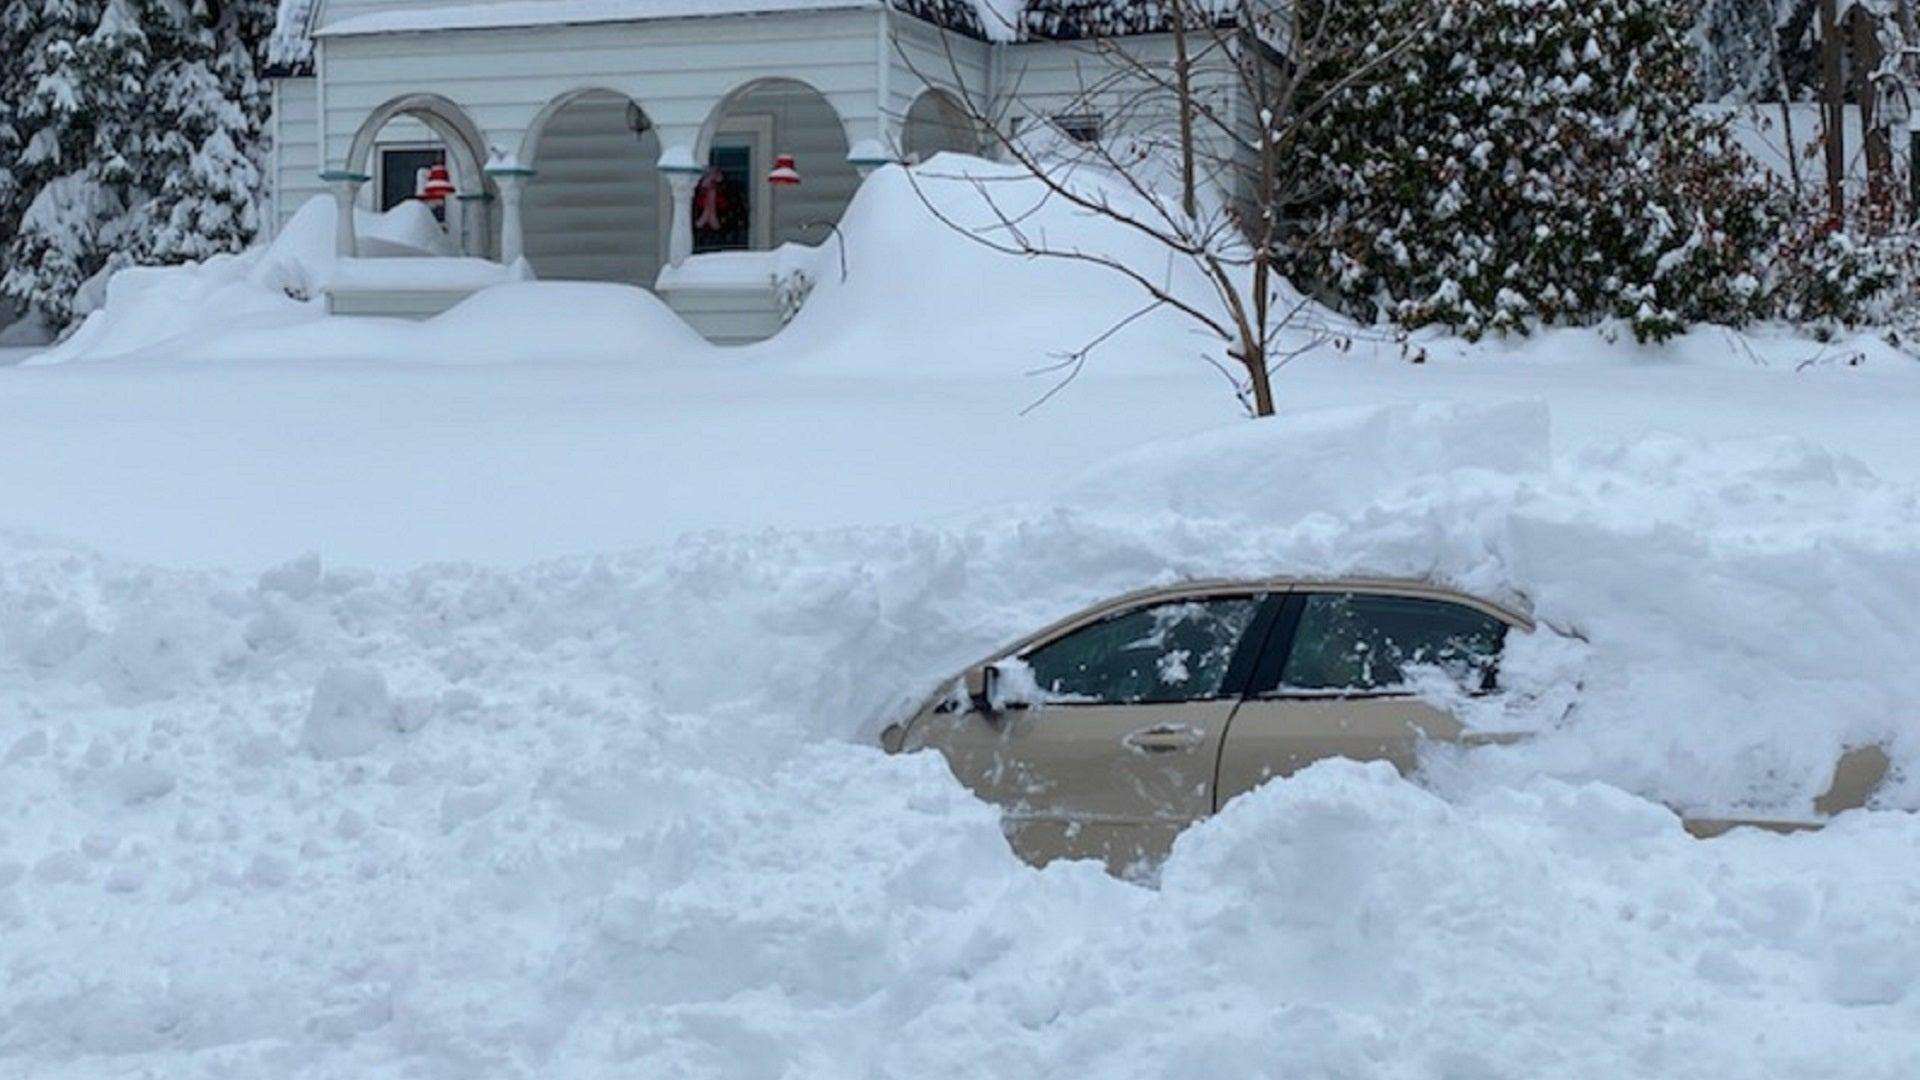 Ketimbun Salju Selama 10 Jam Di dalam Mobil, Masih Hidup